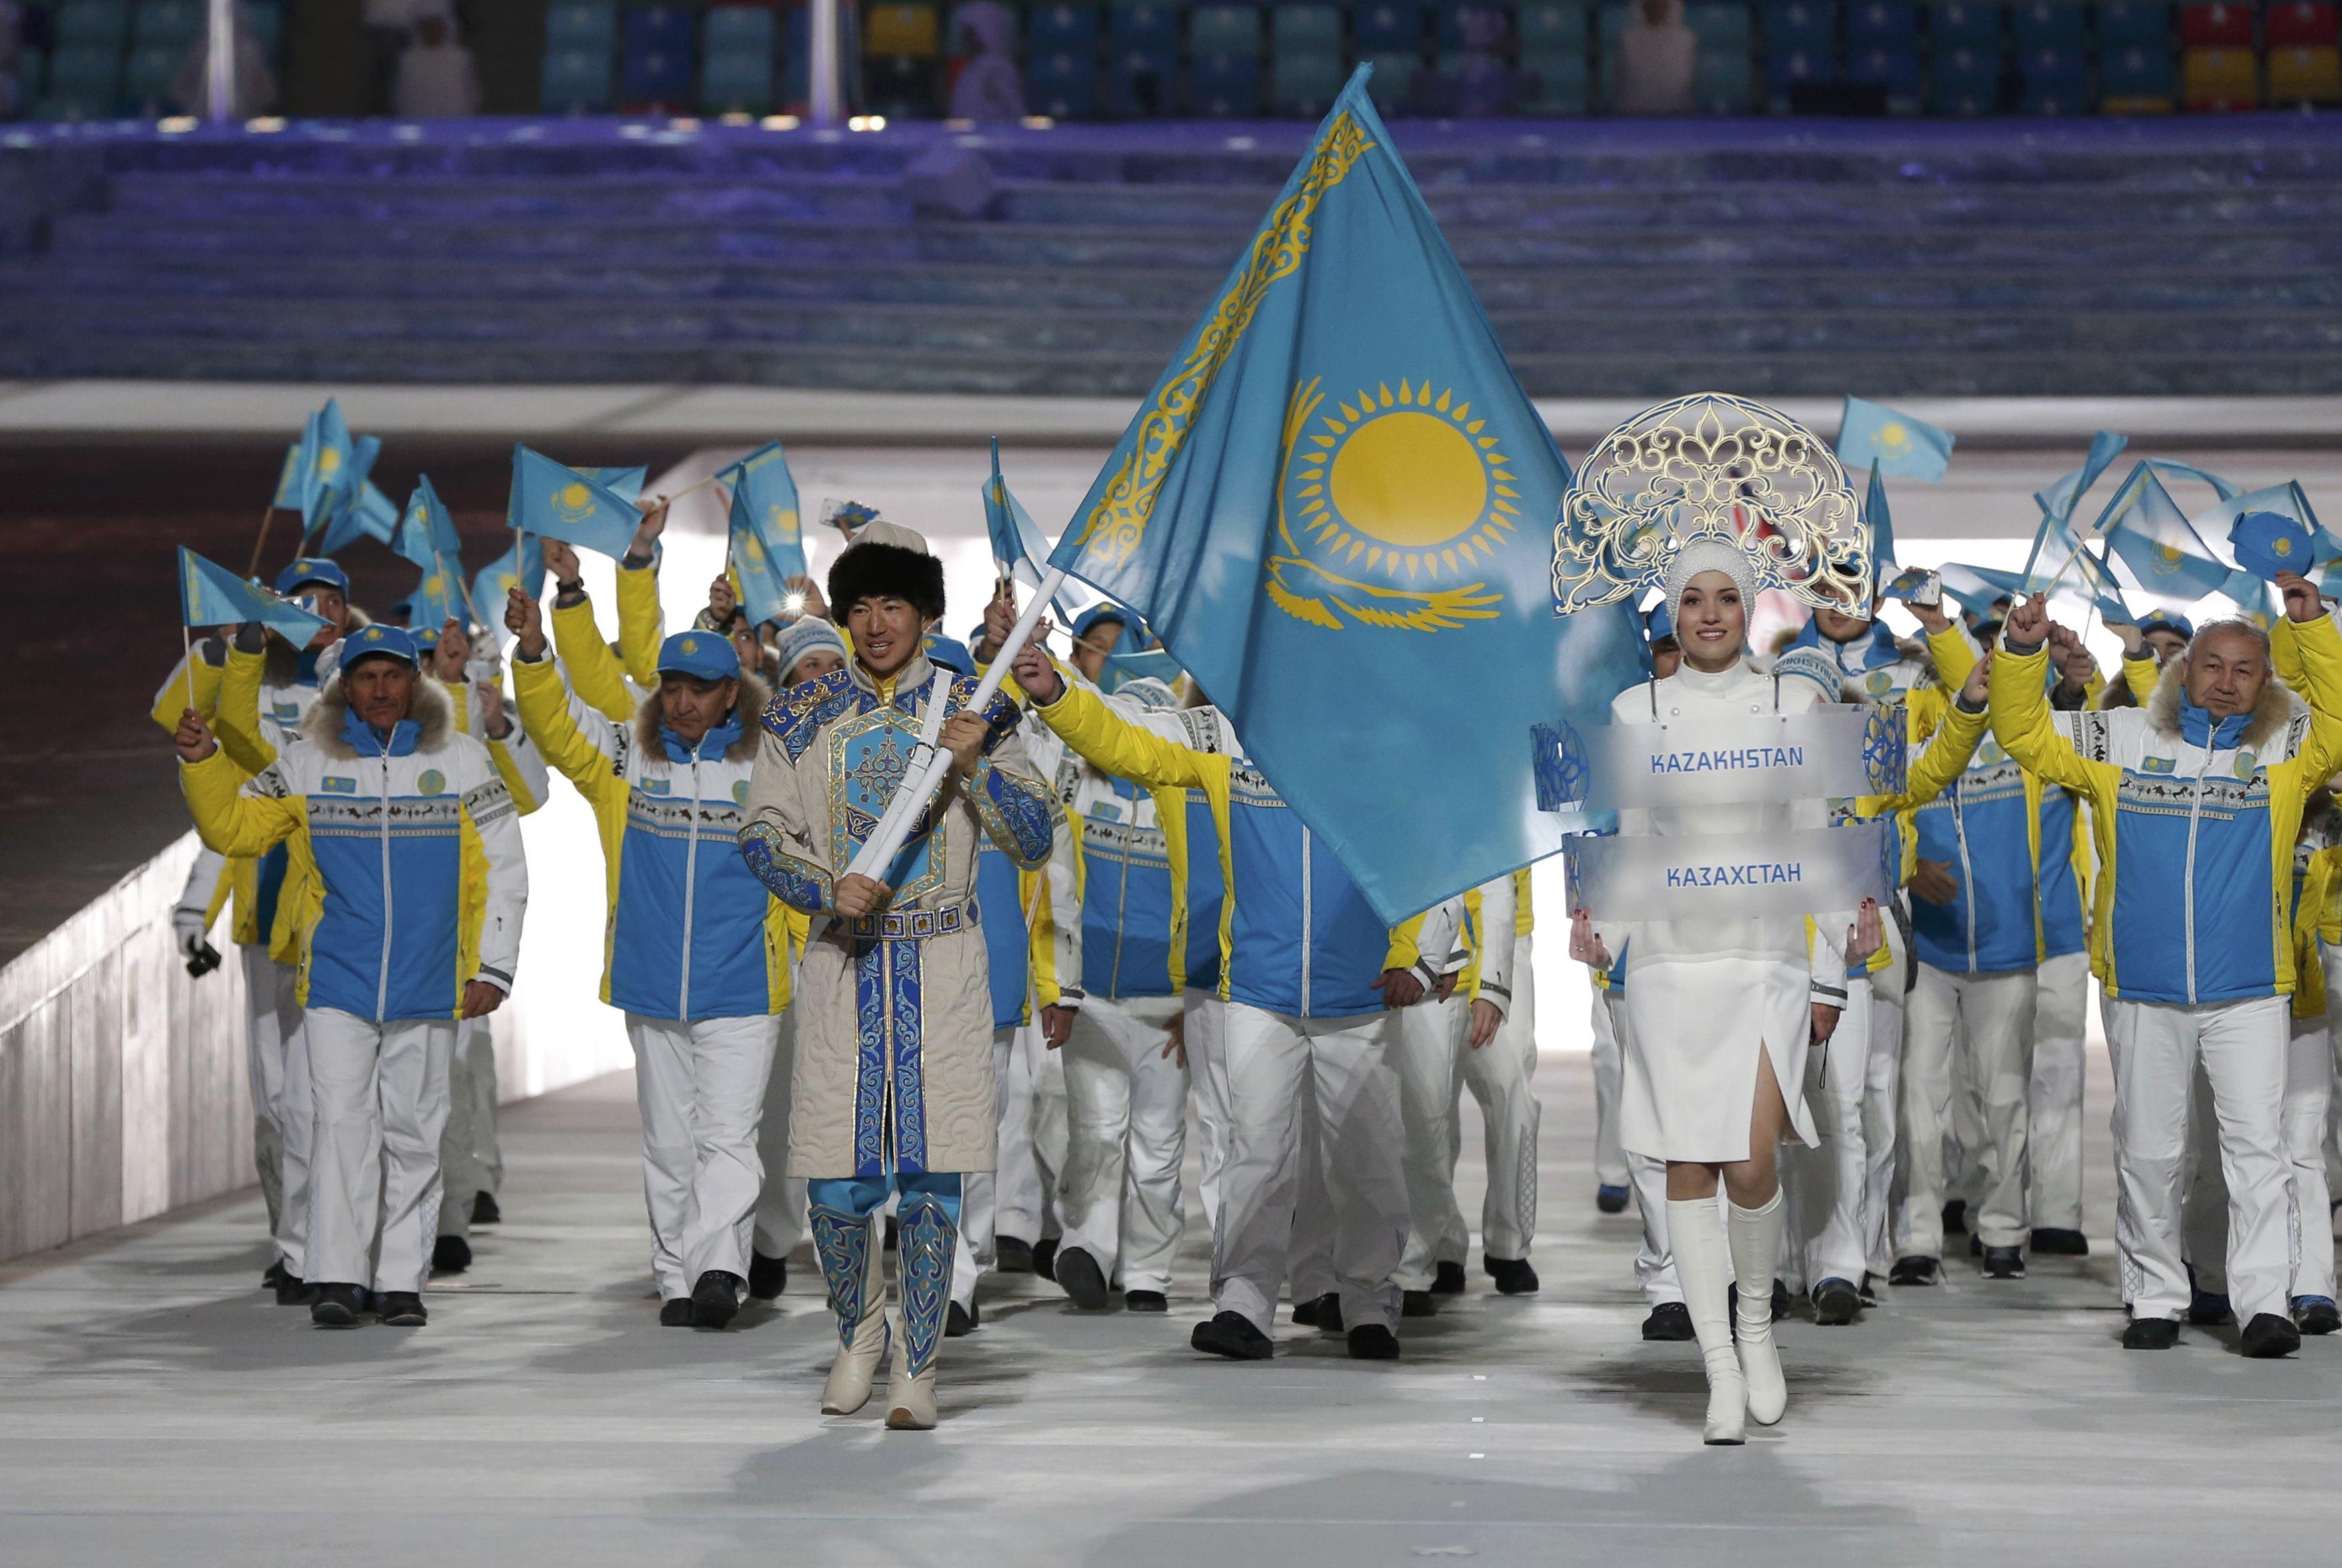 опубликовала олимпиада картинки казахстана поверхность морщинистая